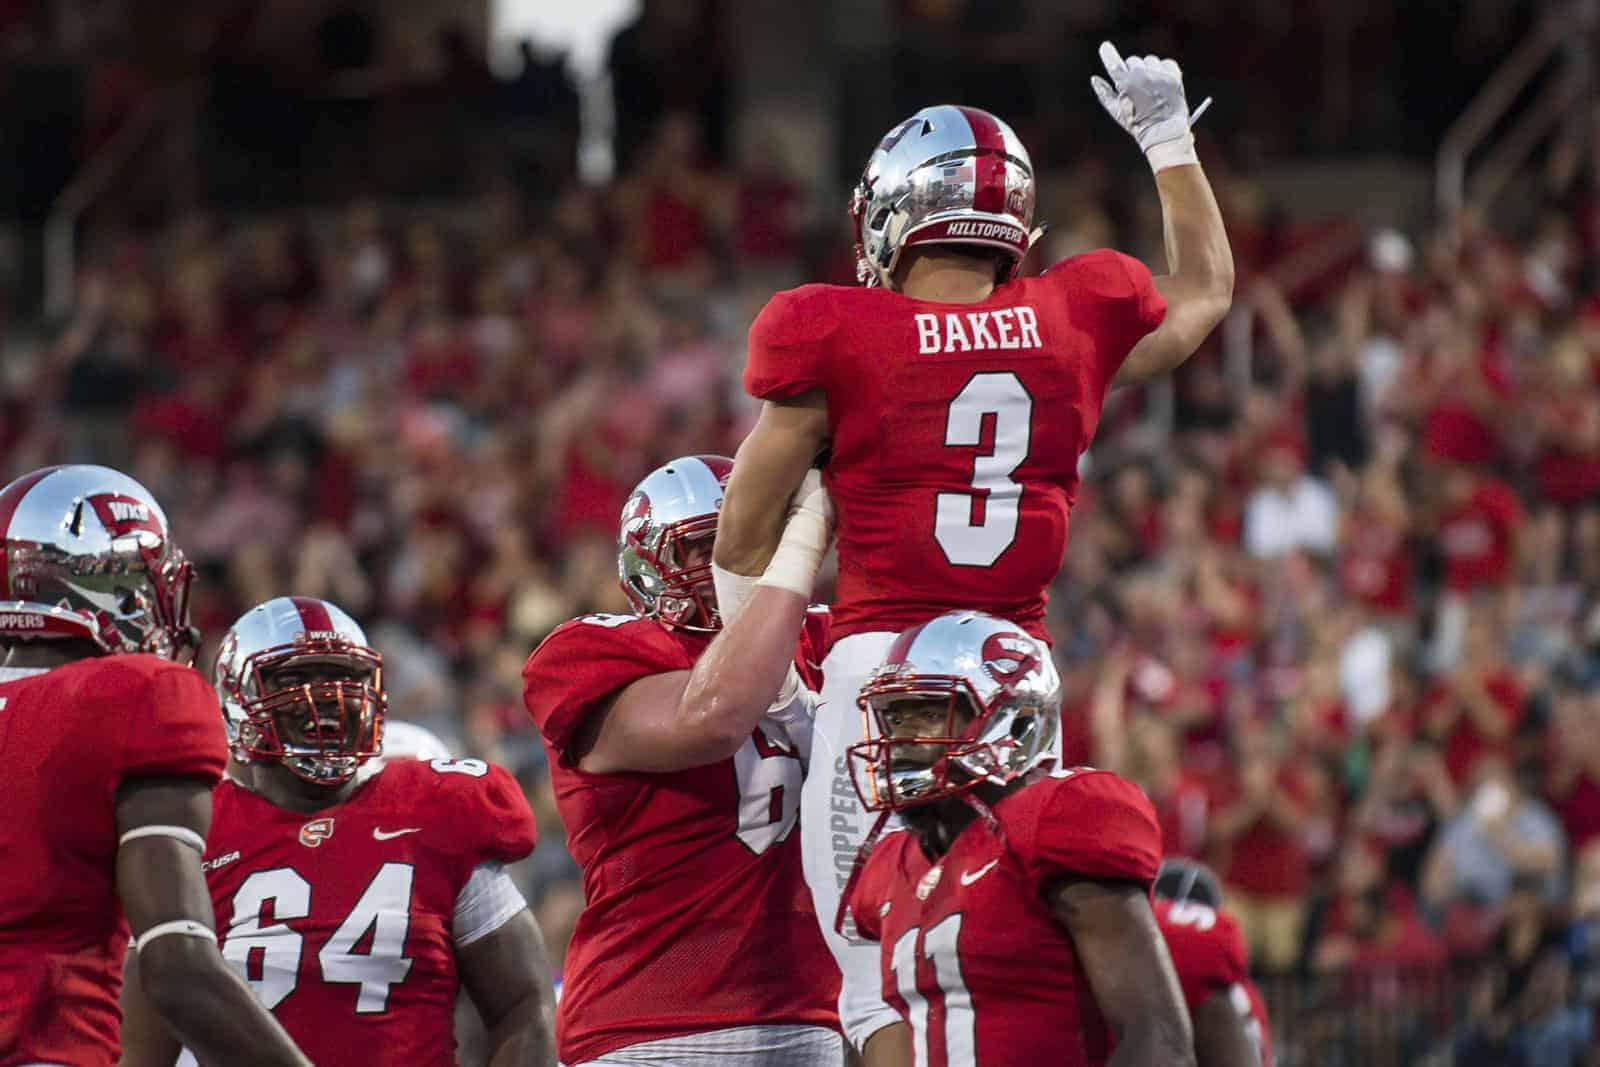 WKU adds future football series with Troy and Cincinnati